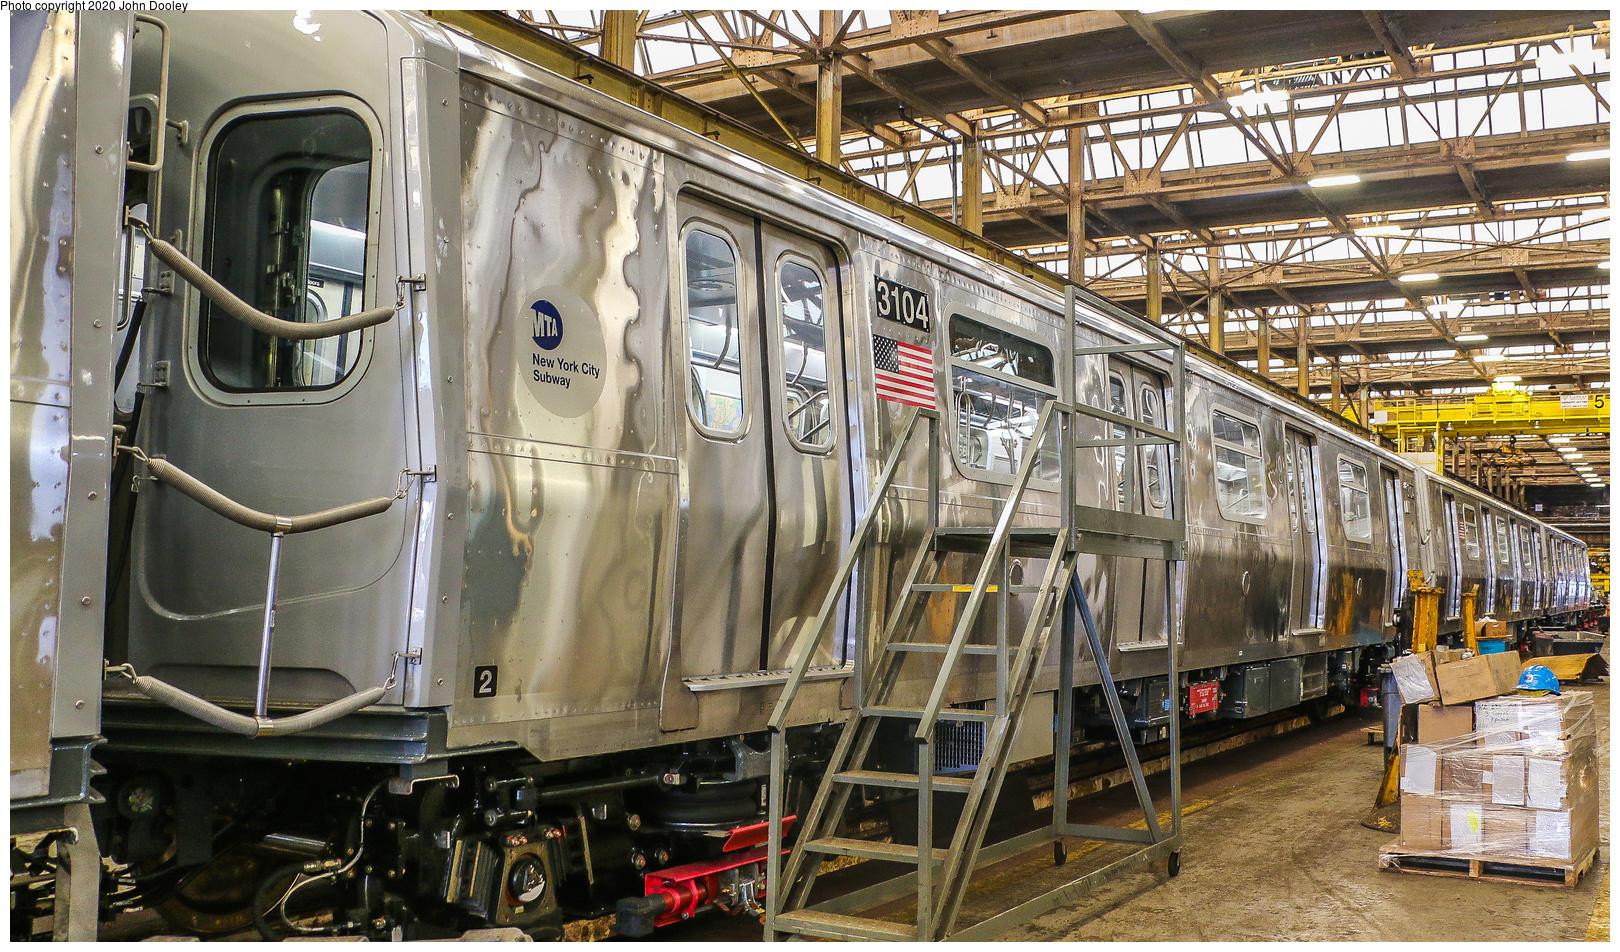 (1024k, 1620x952)<br><b>Country:</b> United States<br><b>City:</b> New York<br><b>System:</b> New York City Transit<br><b>Location:</b> 207th Street Shop<br><b>Car:</b> R-179 (Bombardier, 2016-2019) 3104 <br><b>Photo by:</b> John Dooley<br><b>Date:</b> 6/15/2018<br><b>Viewed (this week/total):</b> 11 / 55